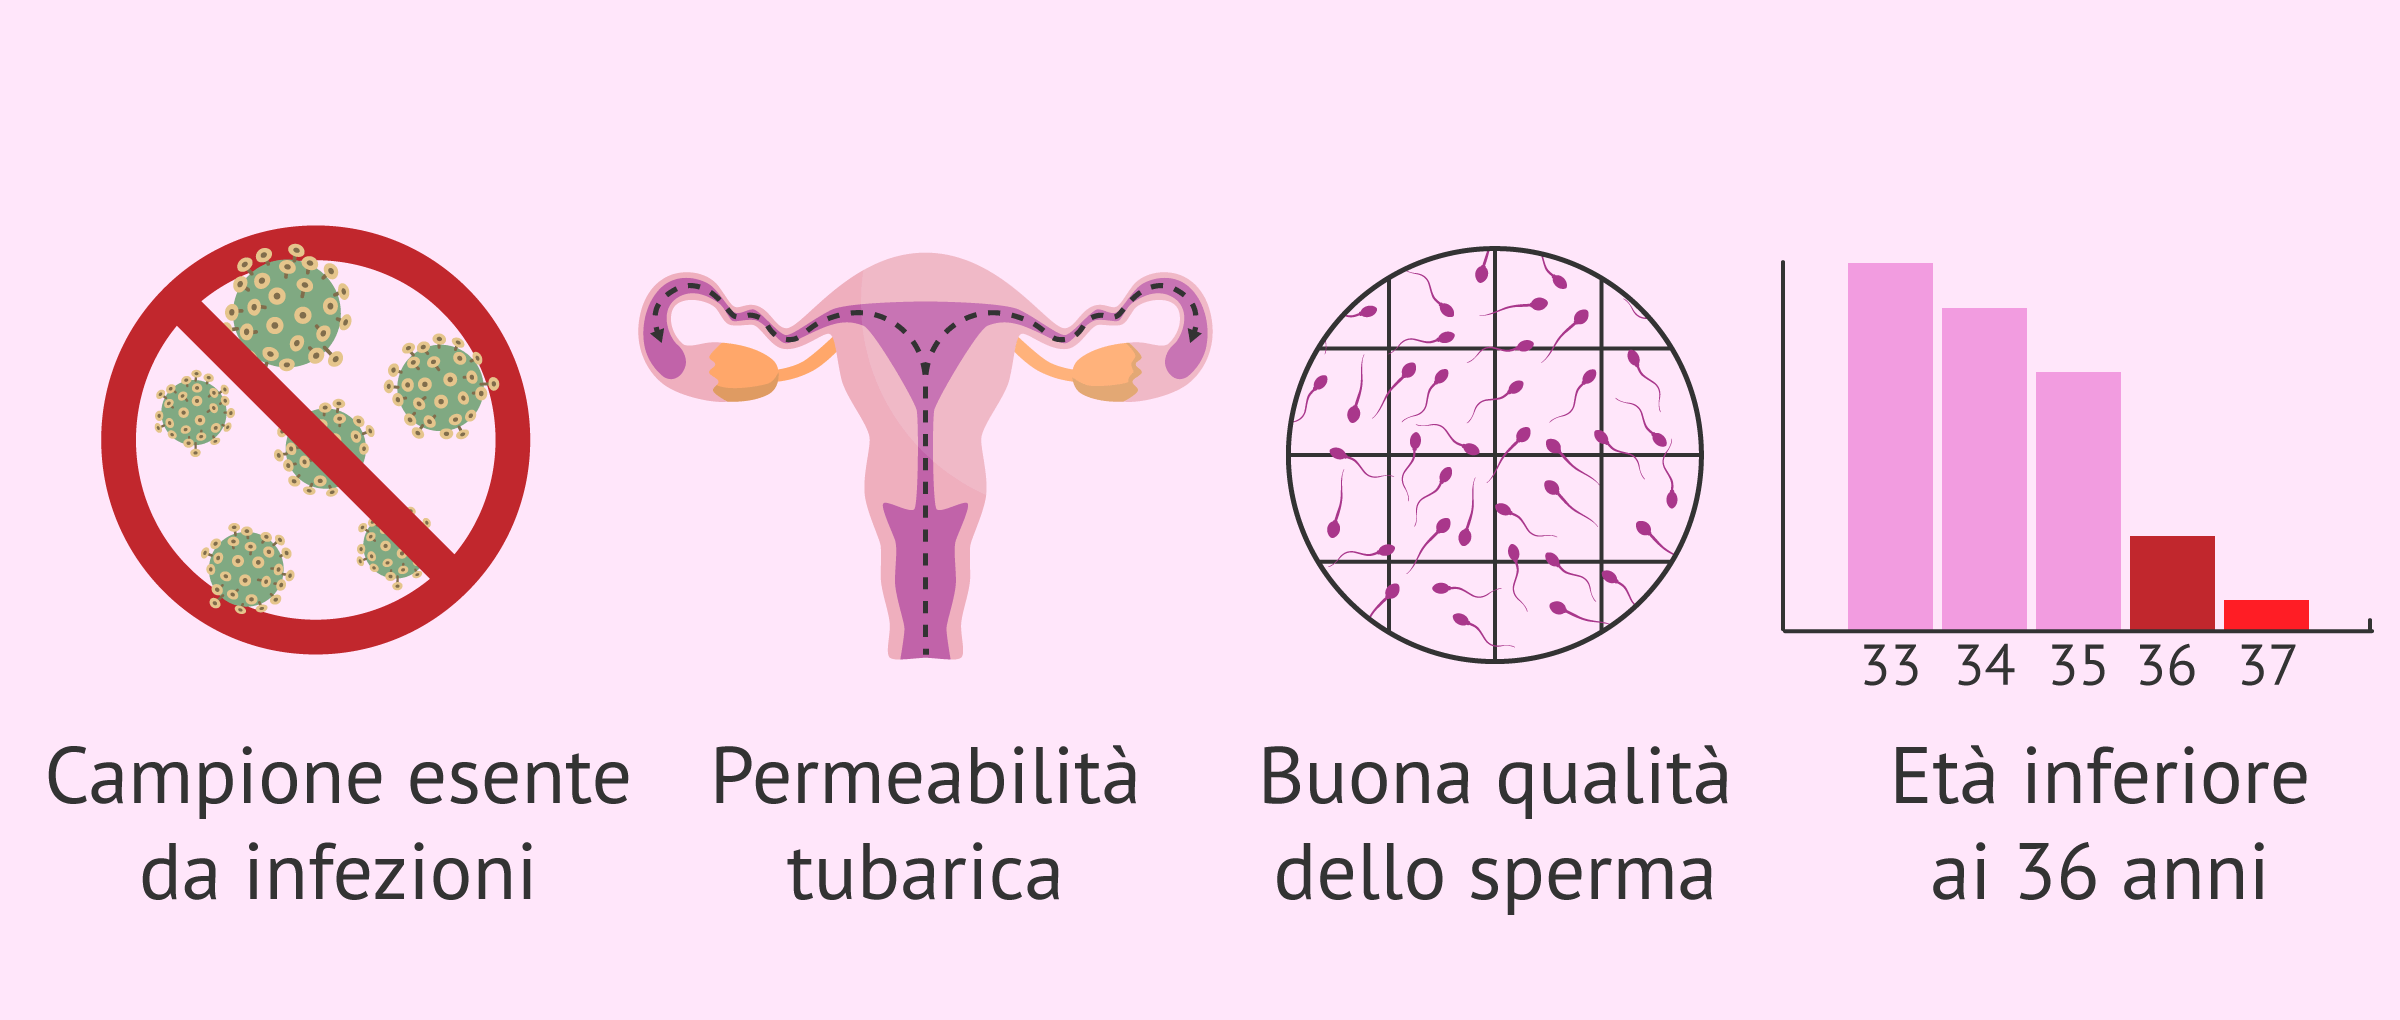 L'inseminazione artificiale